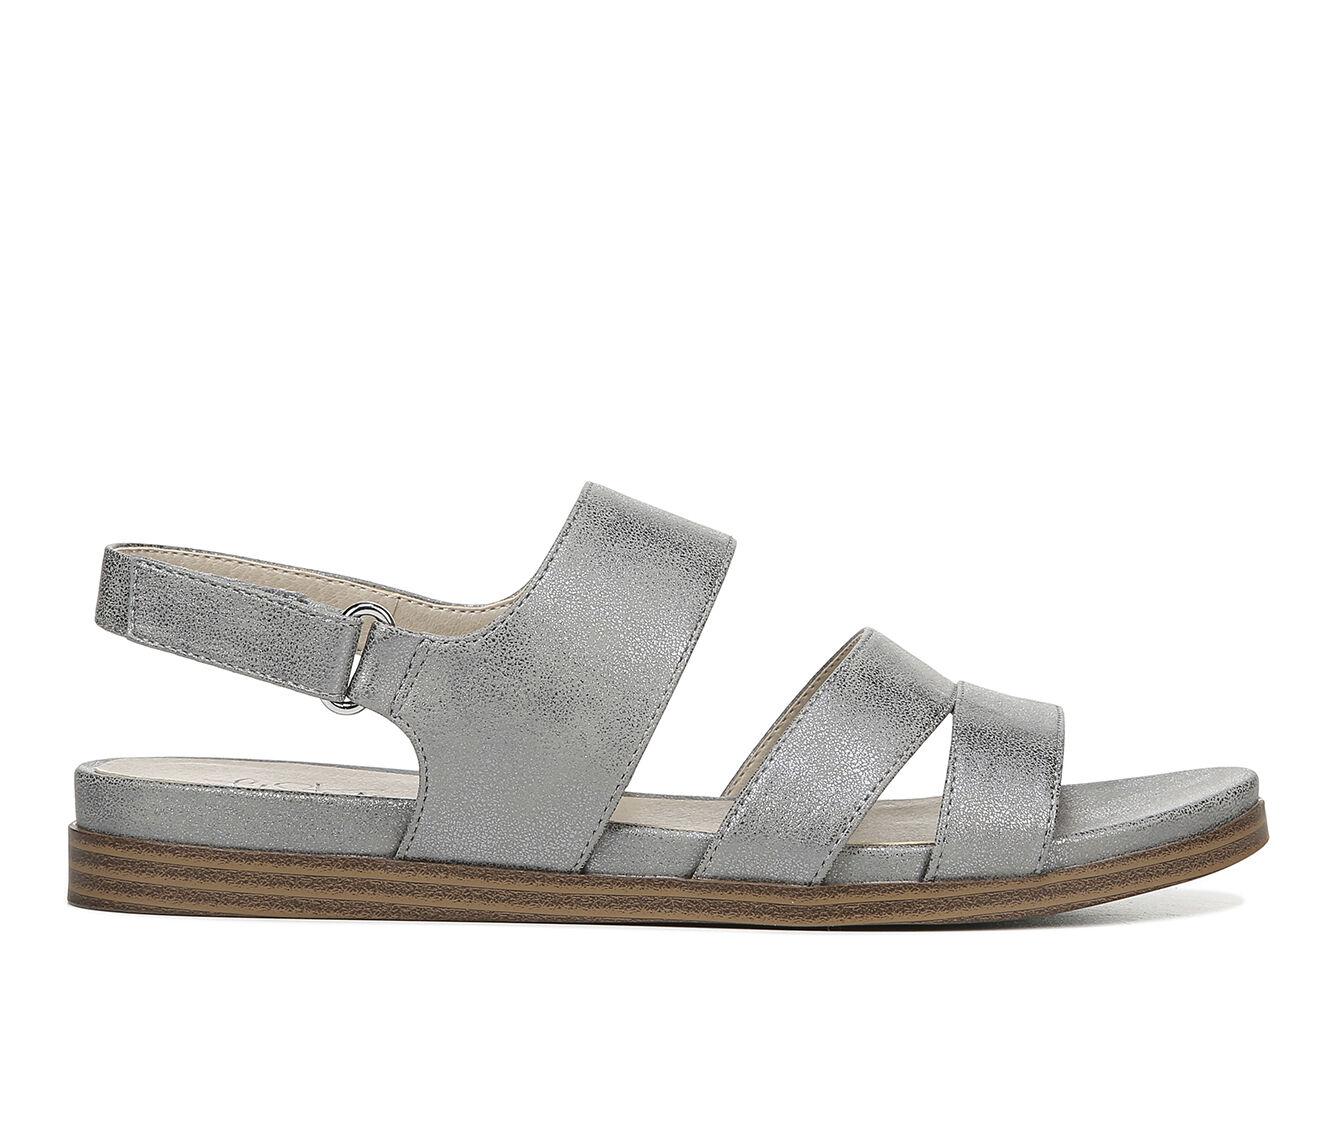 Women's LifeStride Ashley Flatform Sandals Light Grey